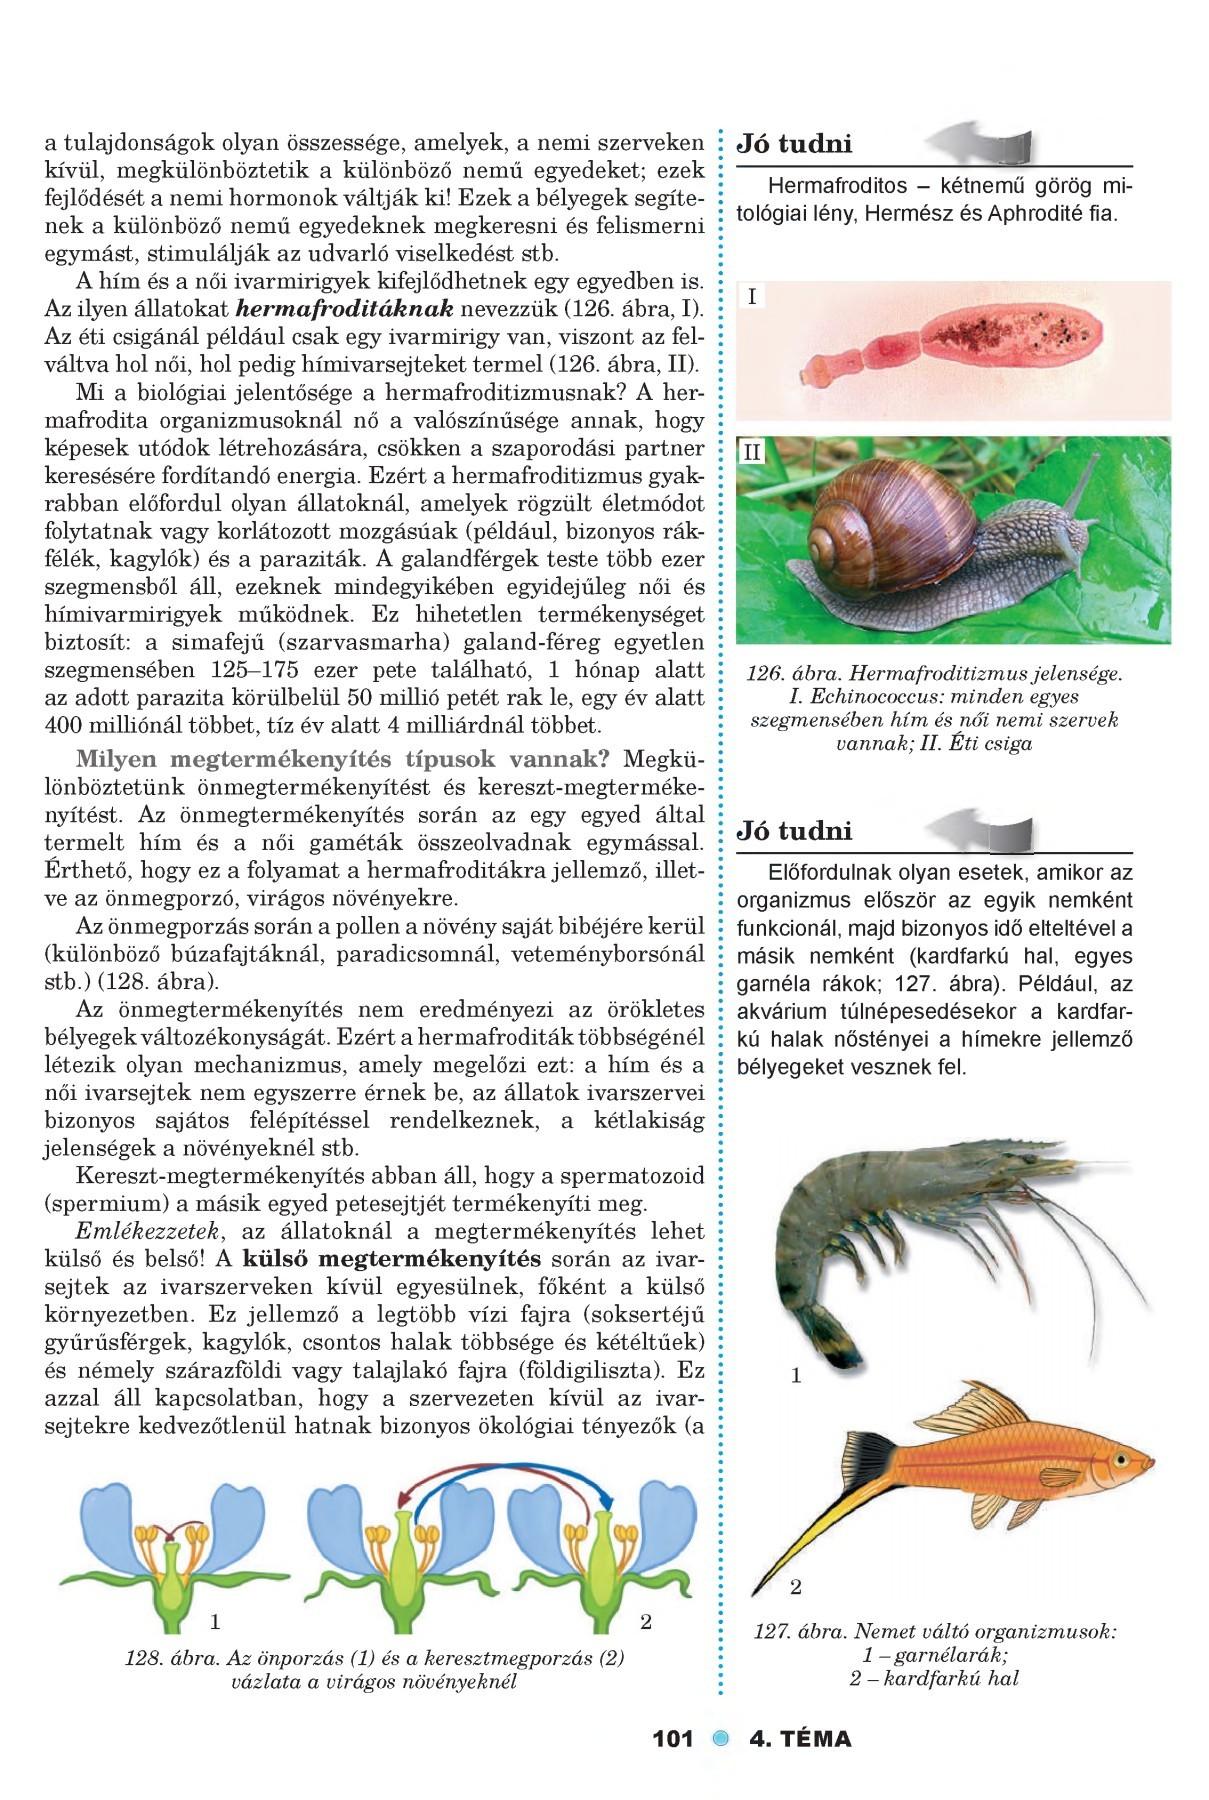 az organizmusok paraziták biológia)